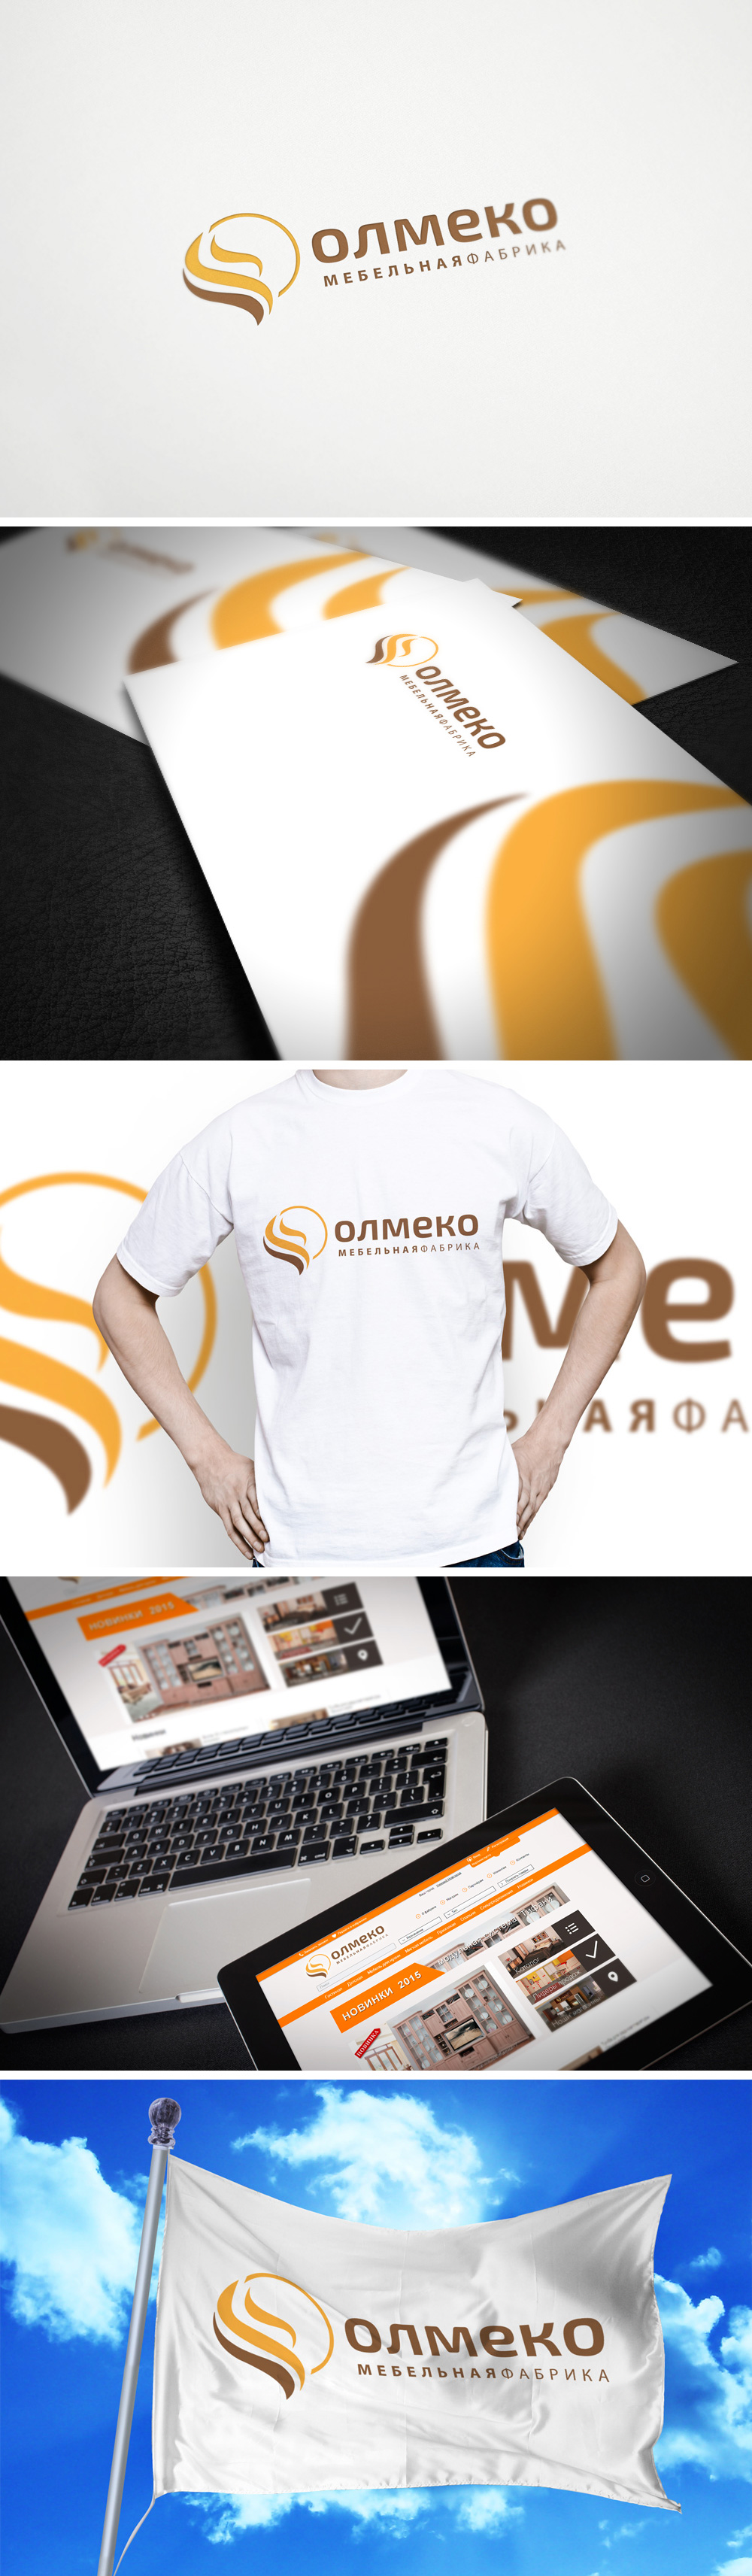 Ребрендинг/Редизайн логотипа Мебельной Фабрики фото f_43855118e7b3ed7b.jpg